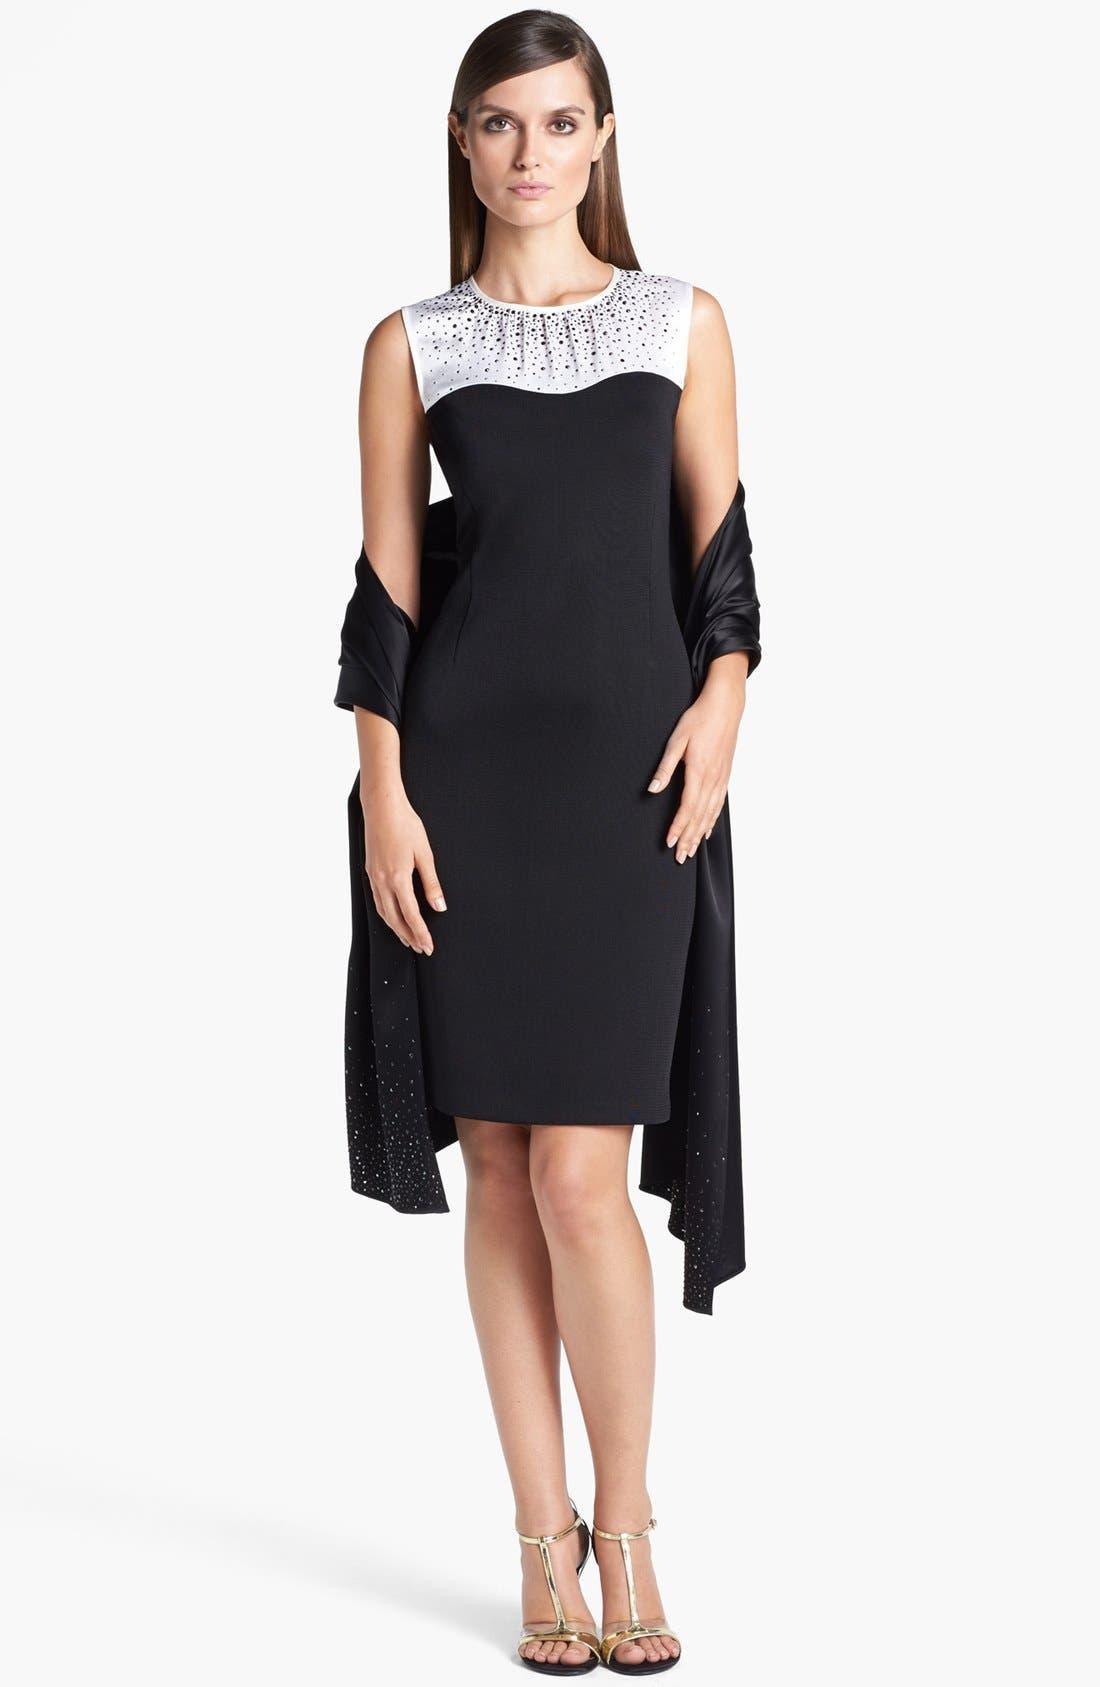 Alternate Image 1 Selected - St. John Collection Satin Yoke Milano Knit Sheath Dress